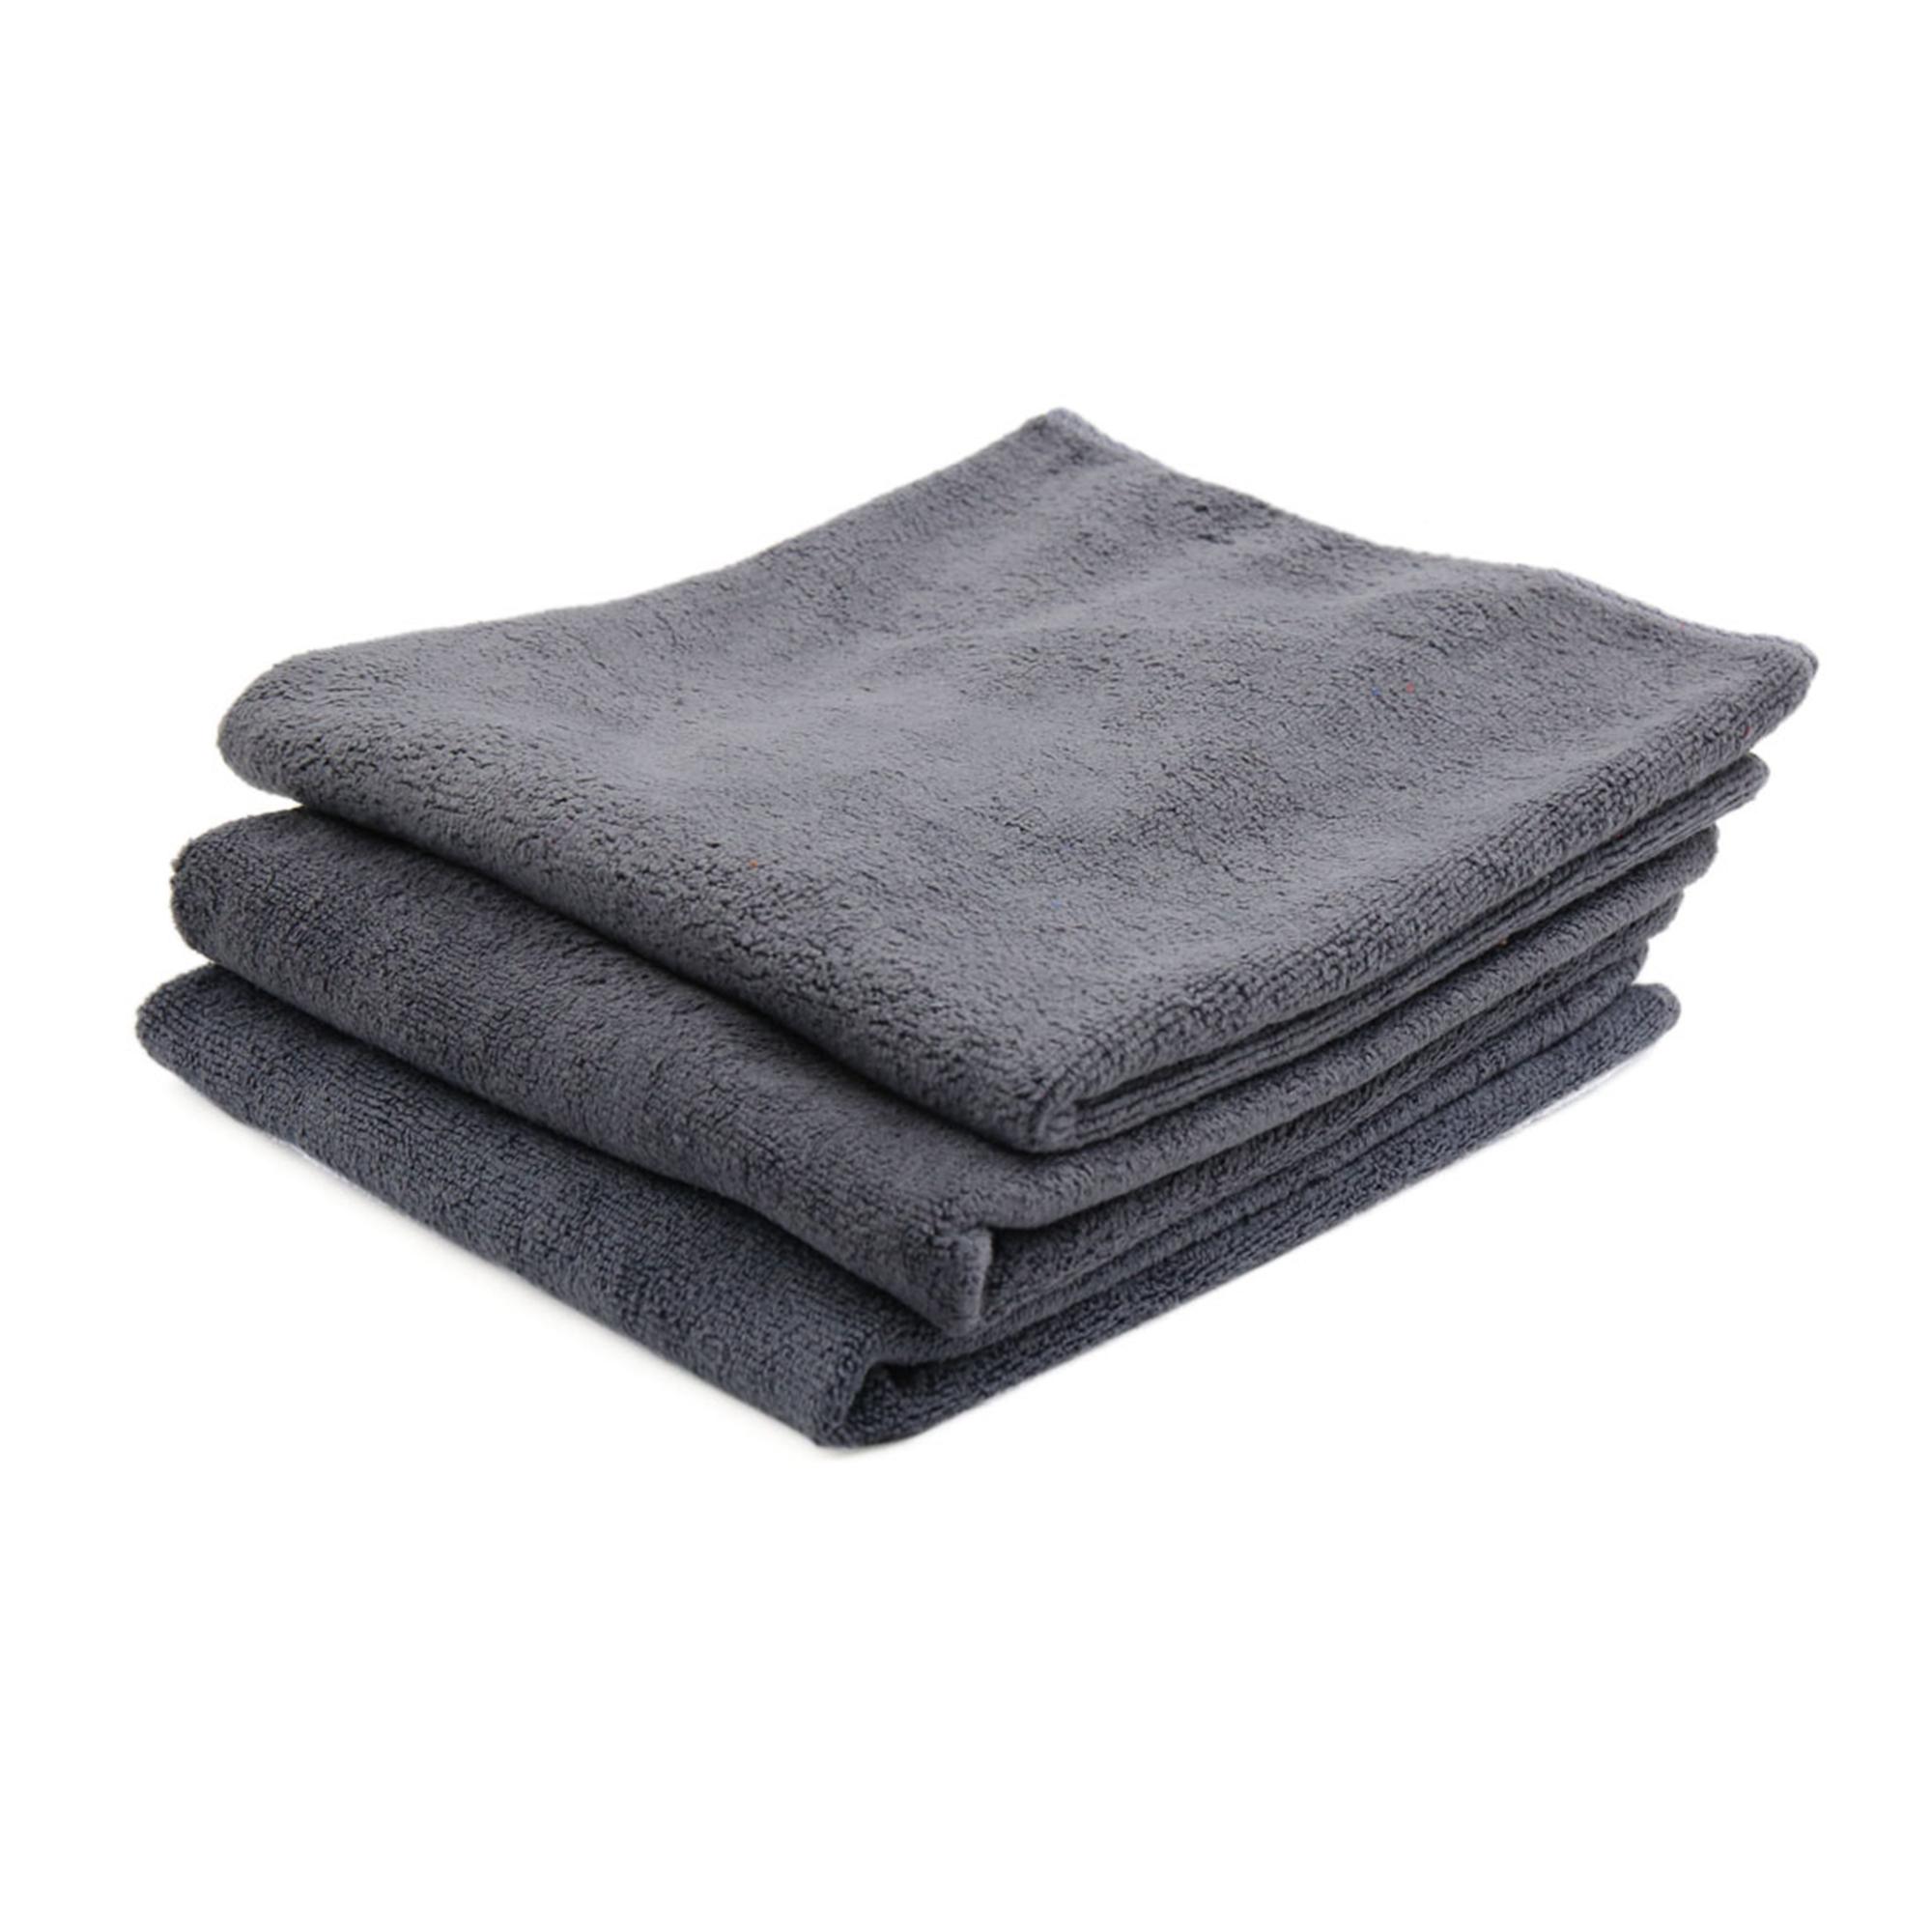 3pcs 40 x 40cm 400GSM Microfiber Car Cleaning Towels Drying Washing Cloth Gray